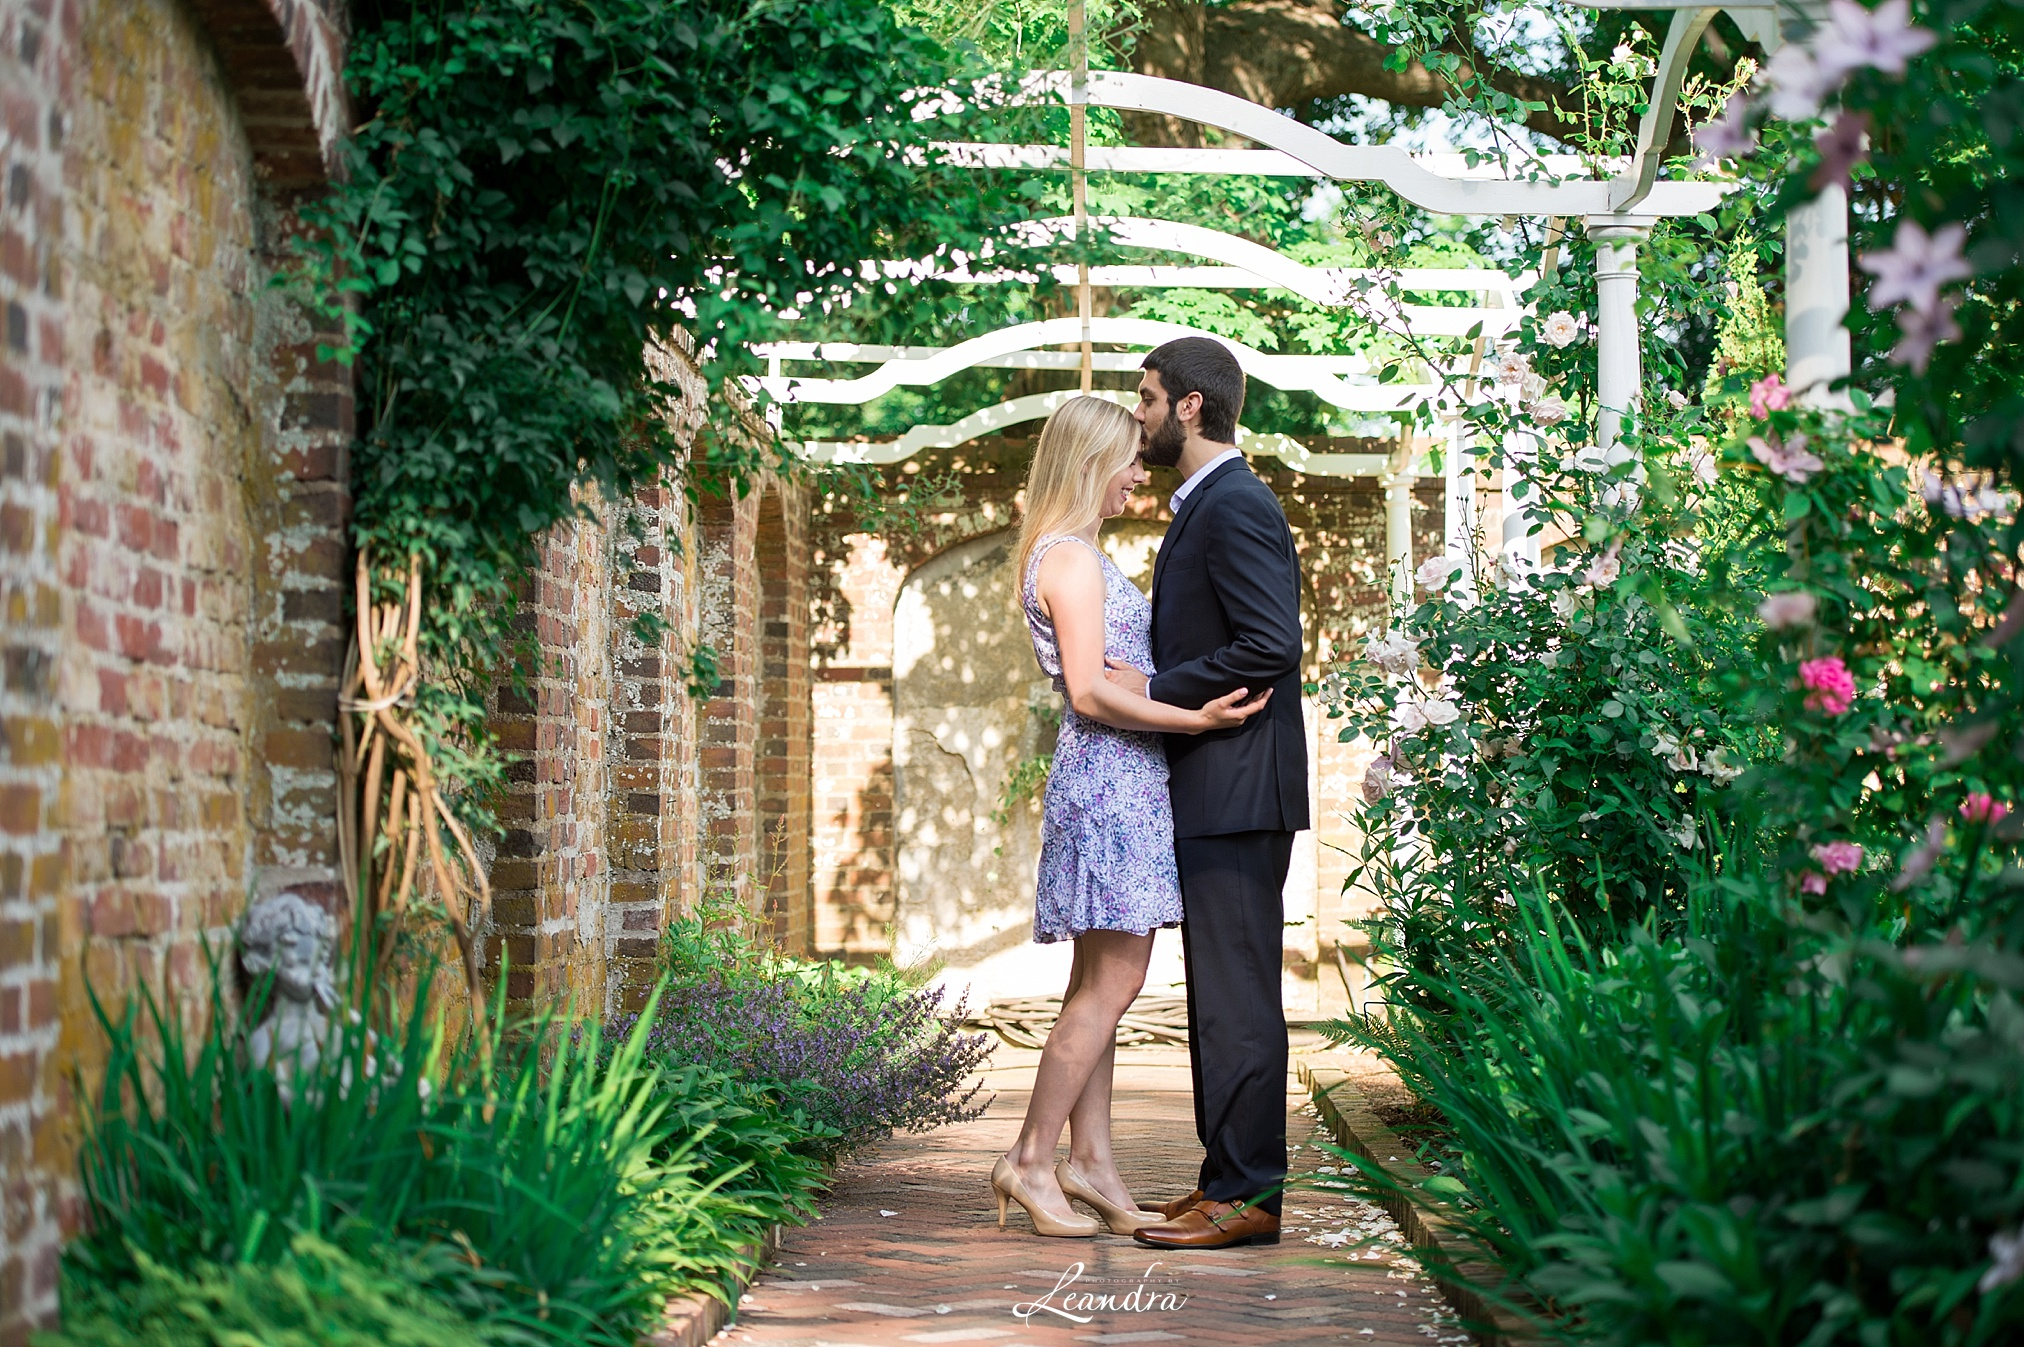 PhotographybyLeandra.KeelerTavern Engagement_0168.jpg